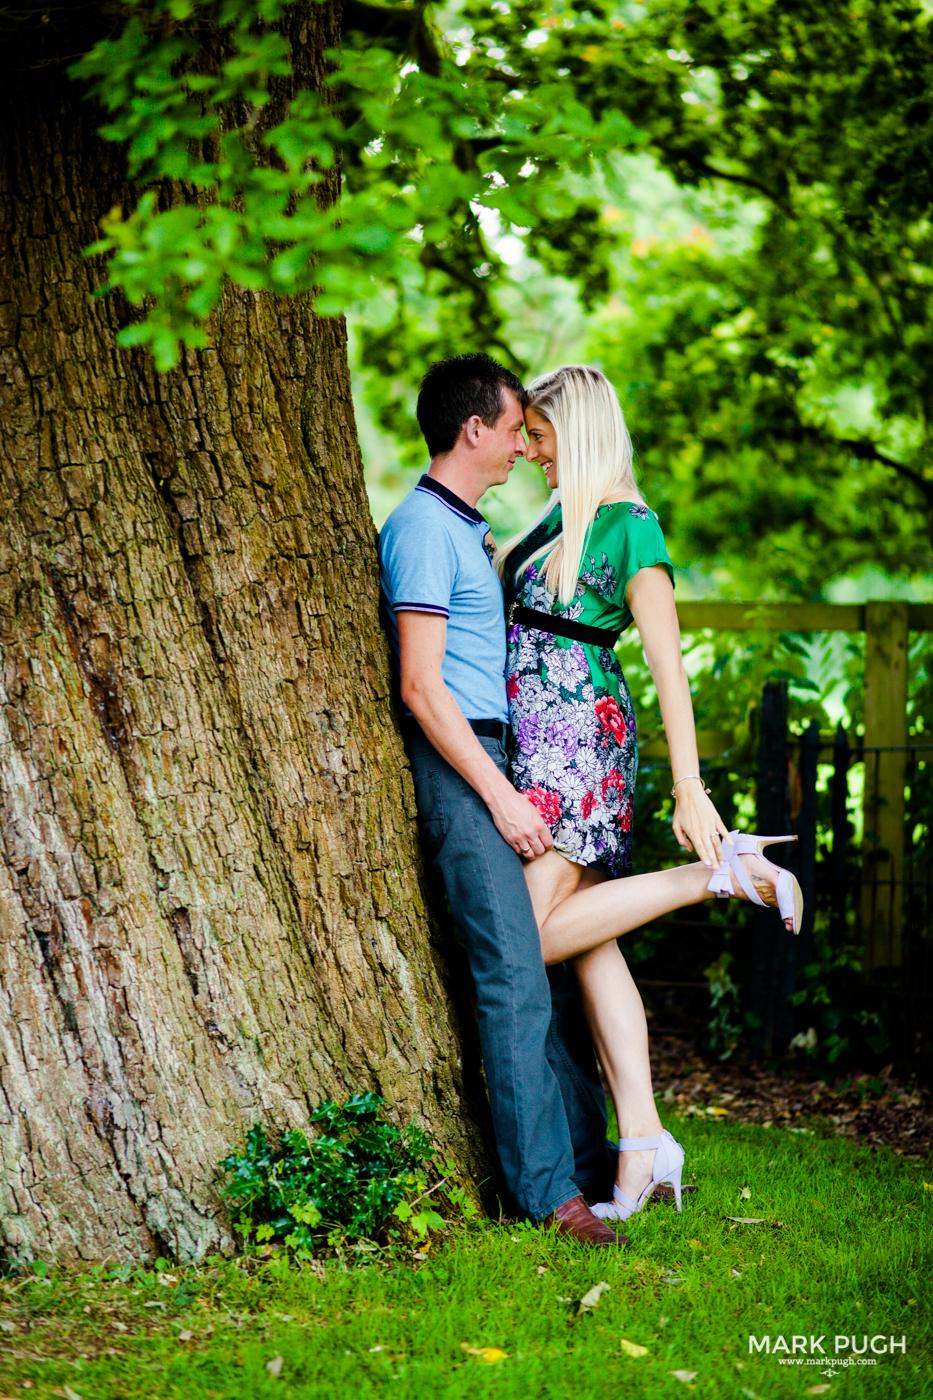 014 Nikki and Richard loveSession preWED Family Photography  at Woodborough Hall by Mark Pugh www.markpugh.com 0600.jpg